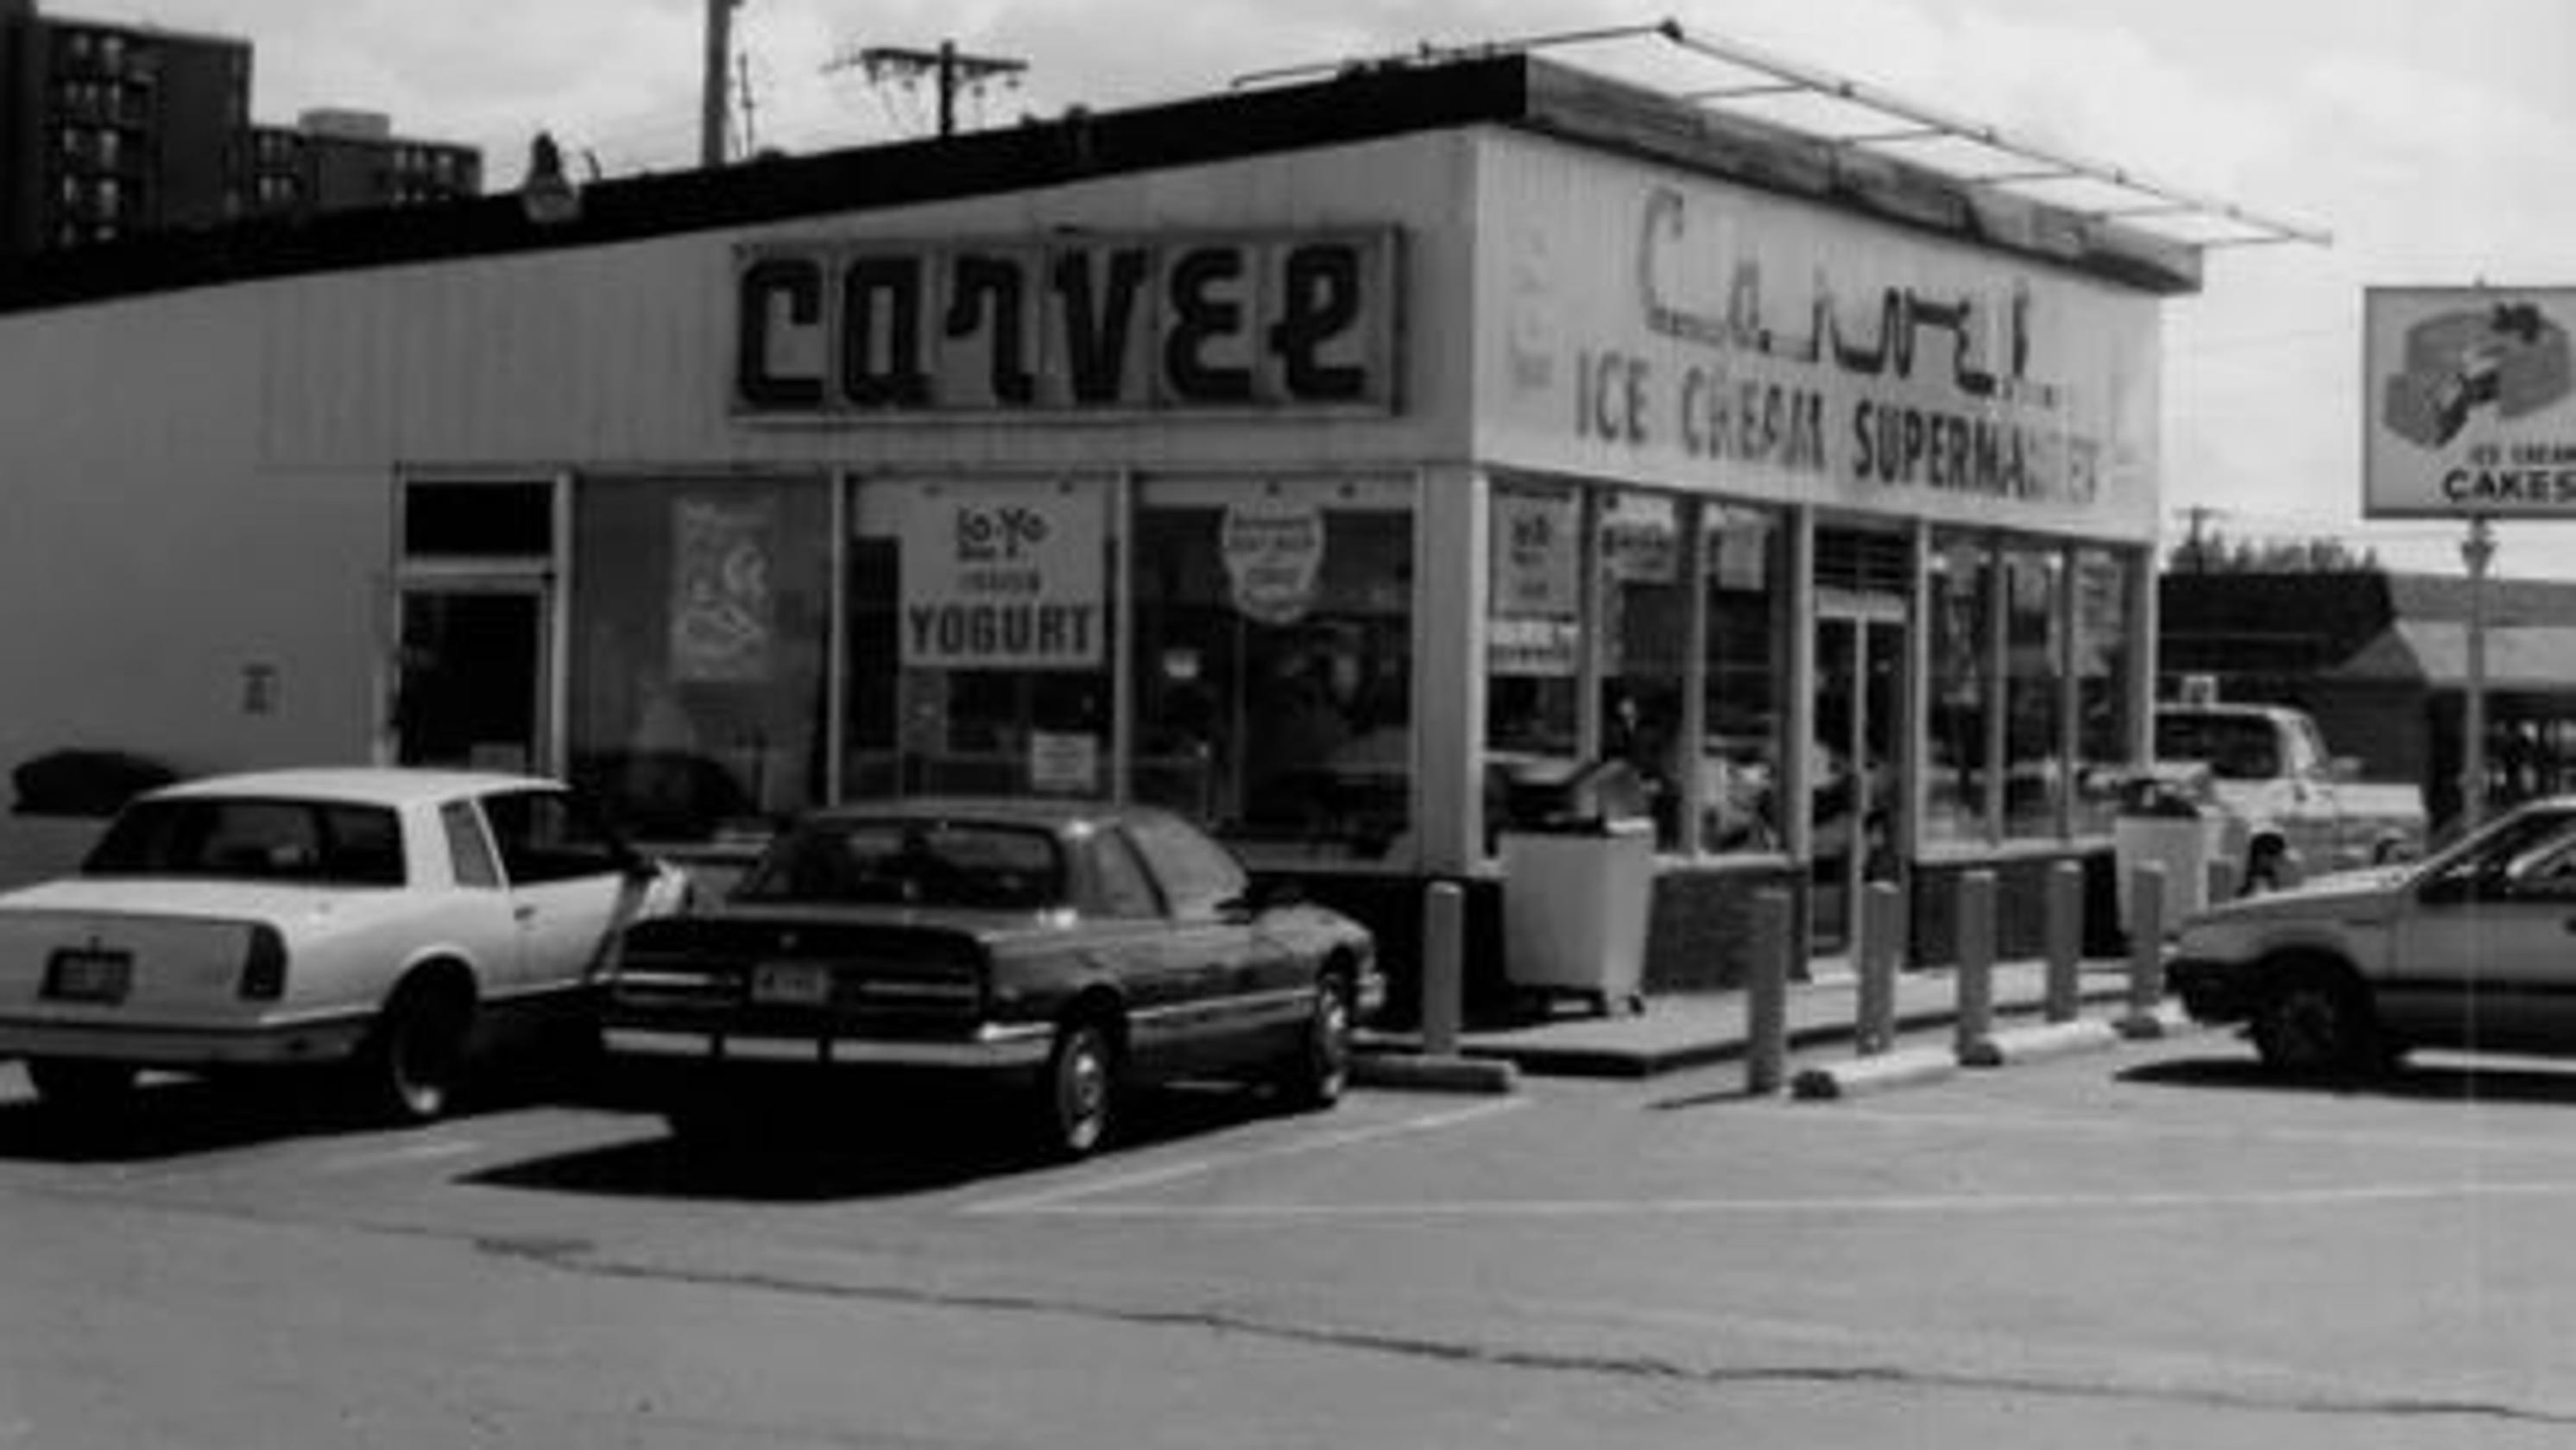 Rochester history: Carvel ice cream